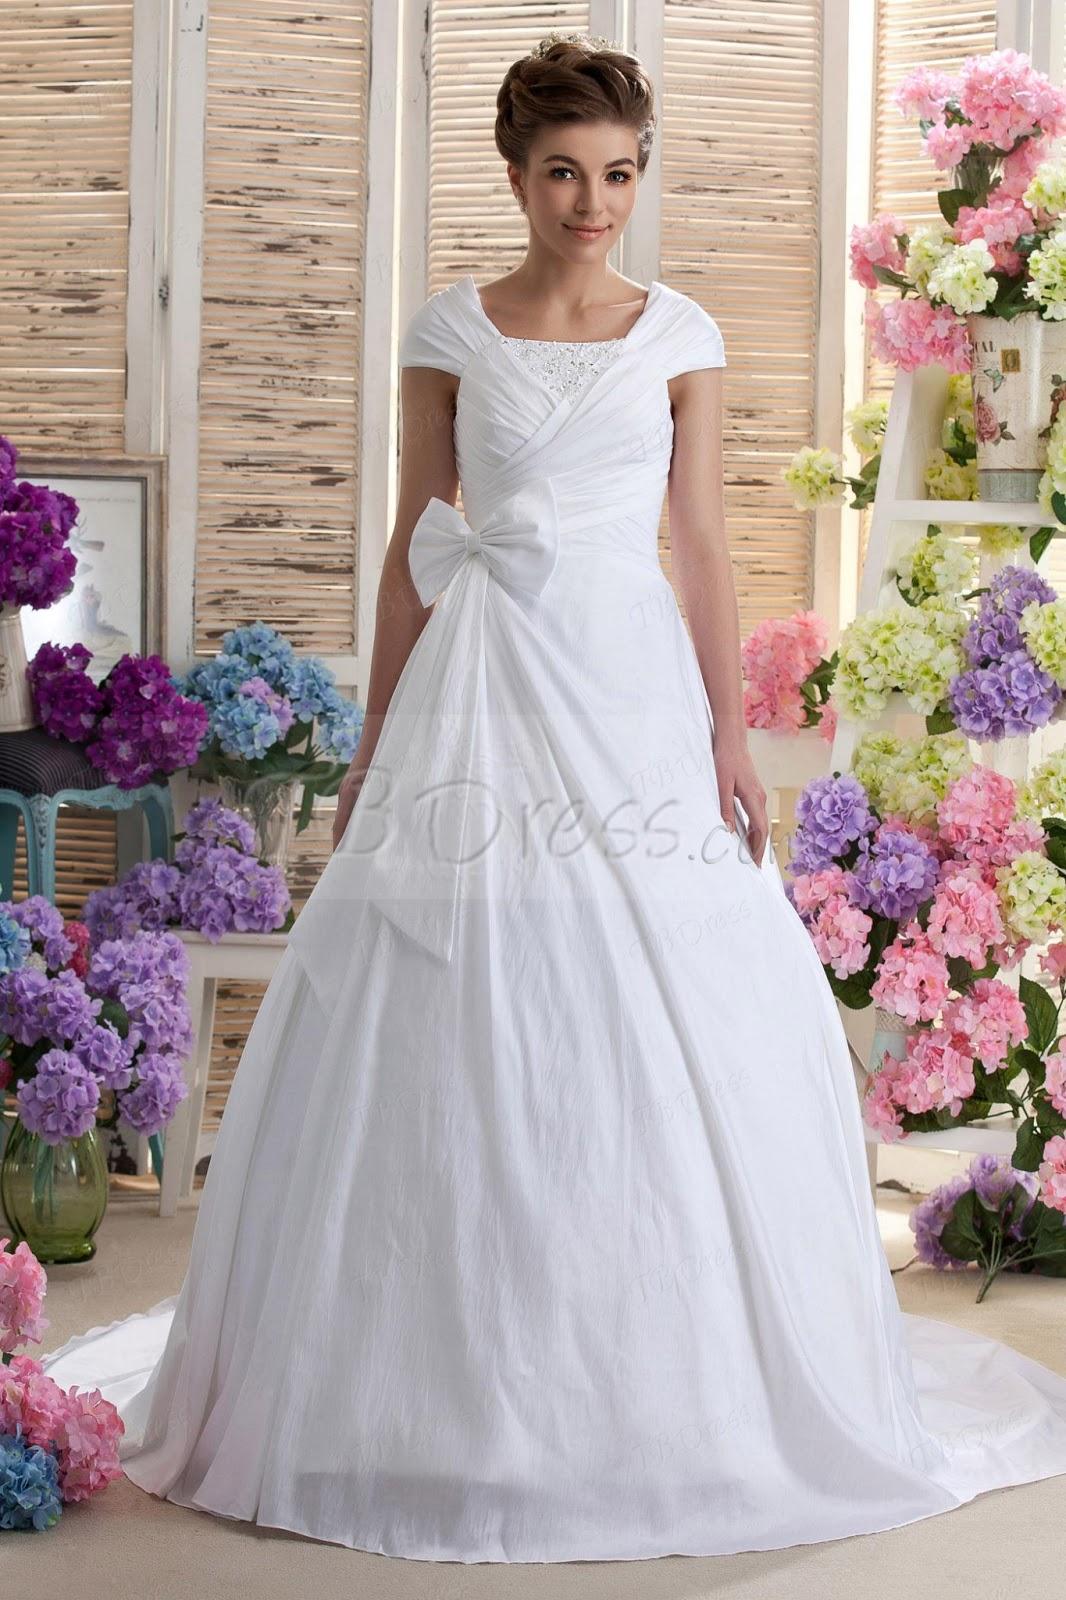 Lace wedding dresses for bride choosing nice cheap casual for Nice cheap wedding dresses